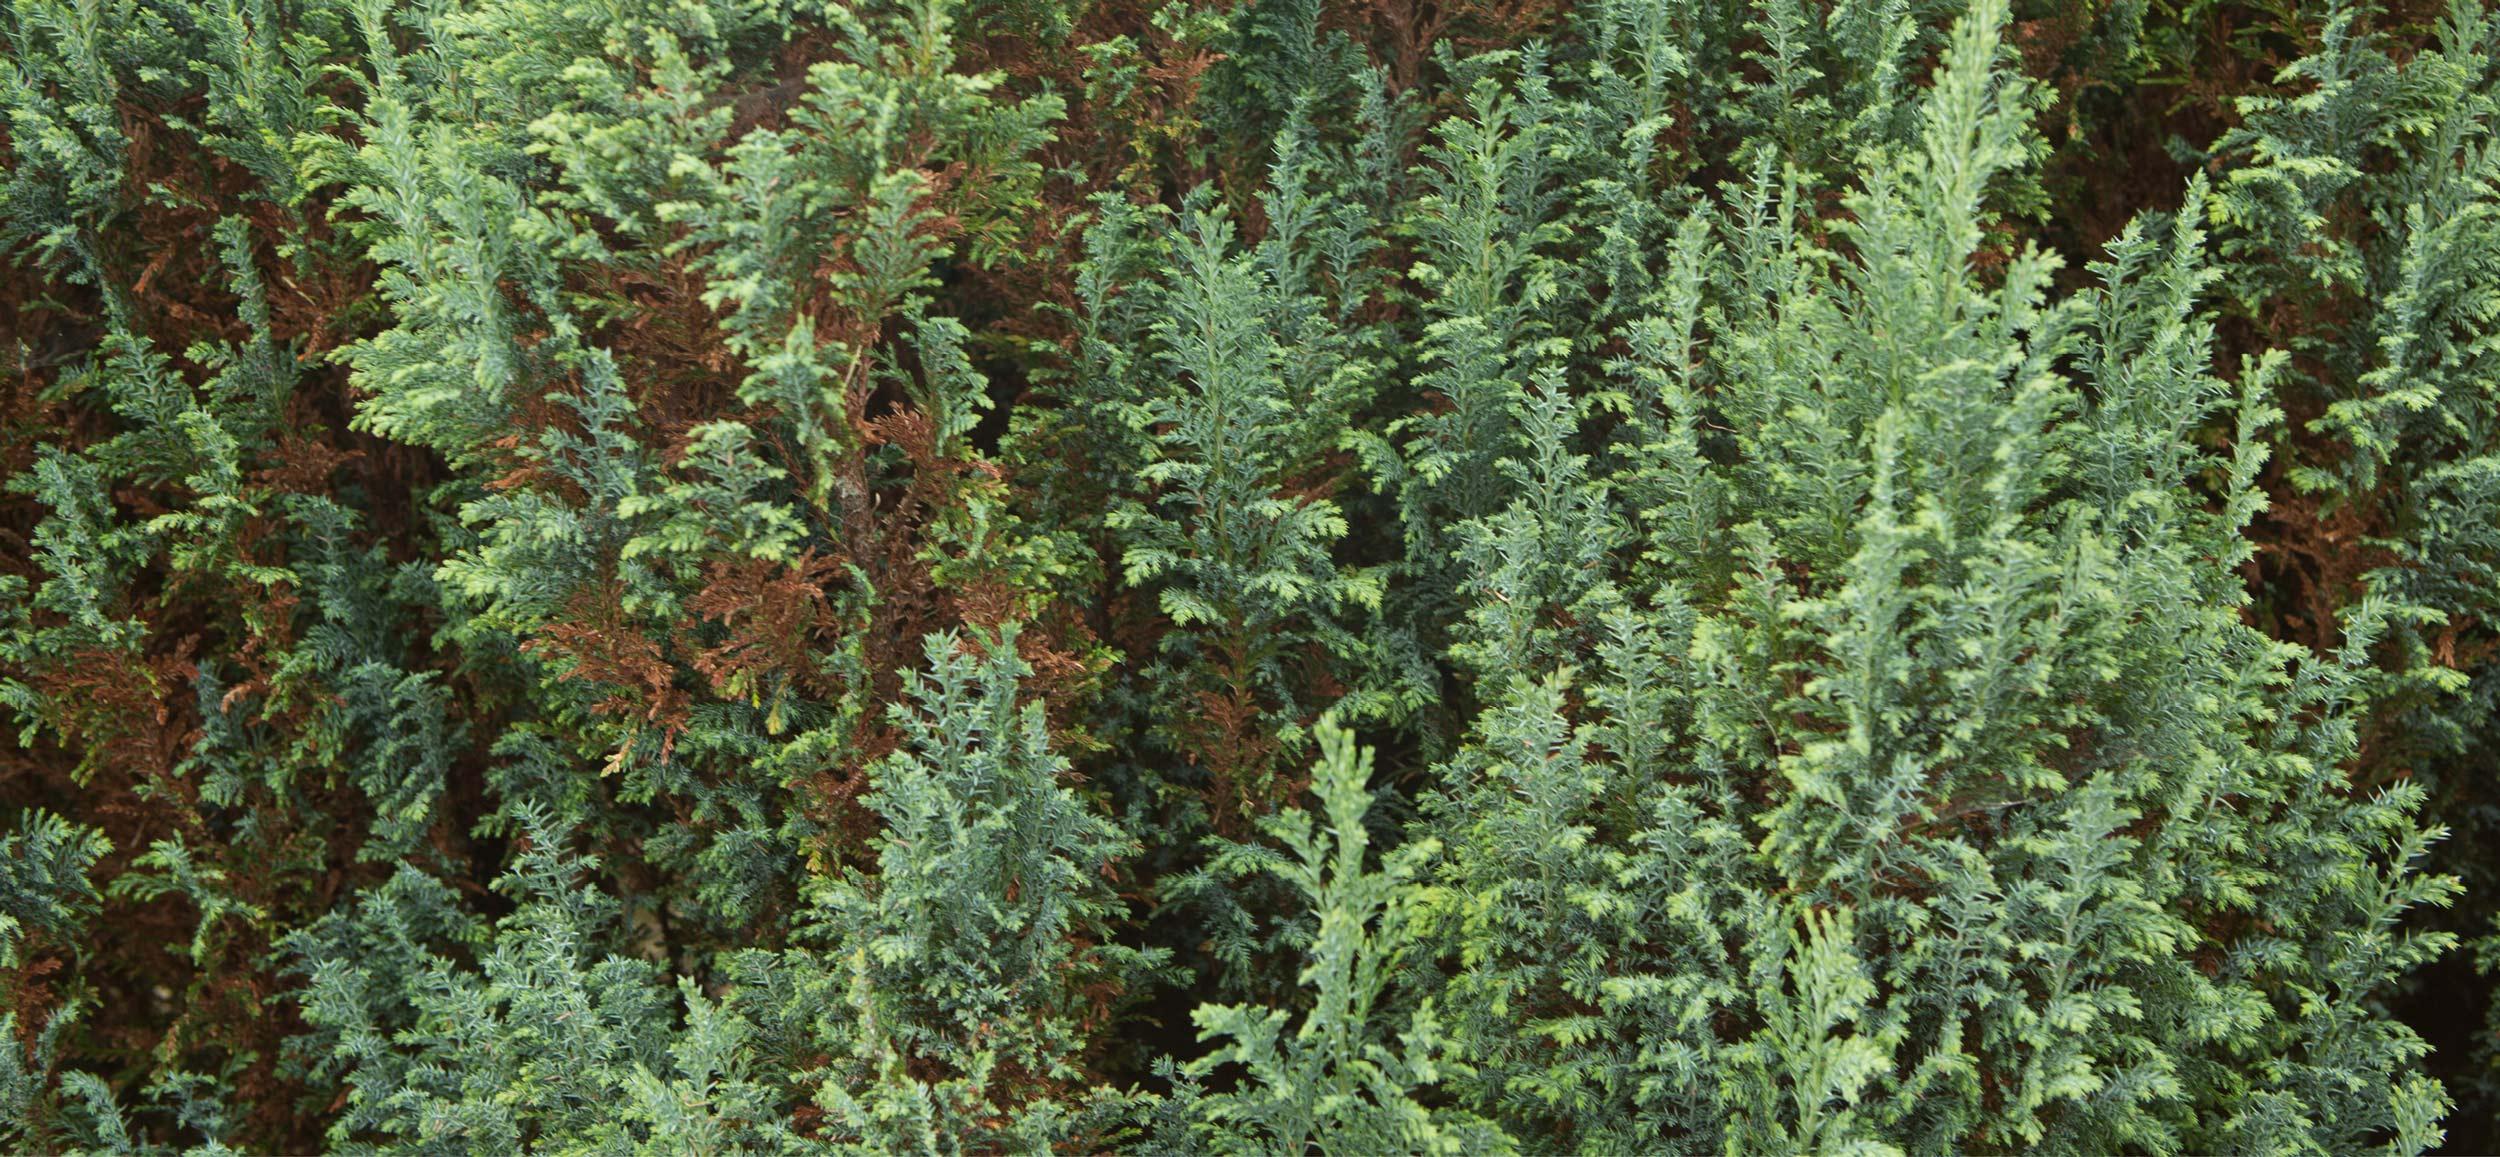 Novas video and photography production soft evergreen foliage